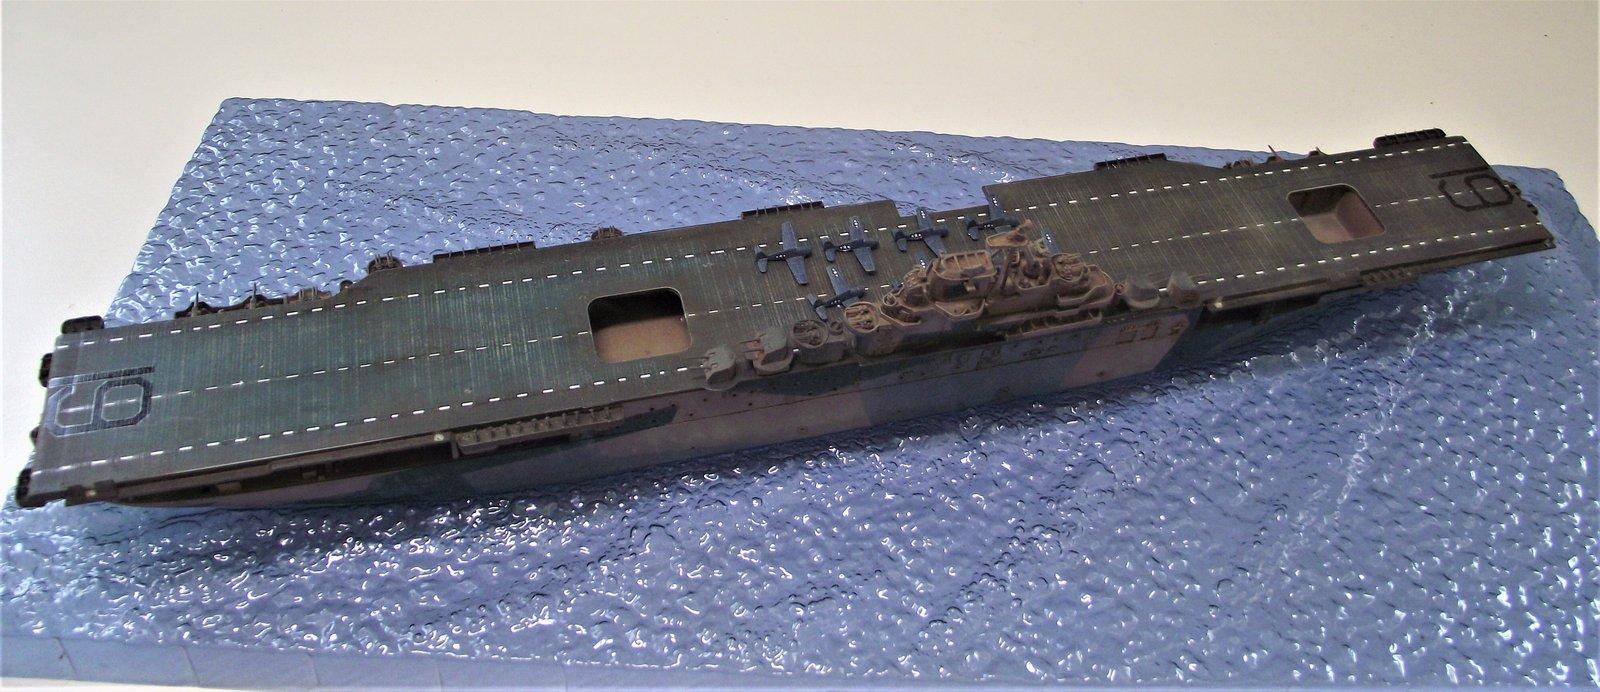 USS Hancok (Trumpeter 1/700°) 21061801003790961